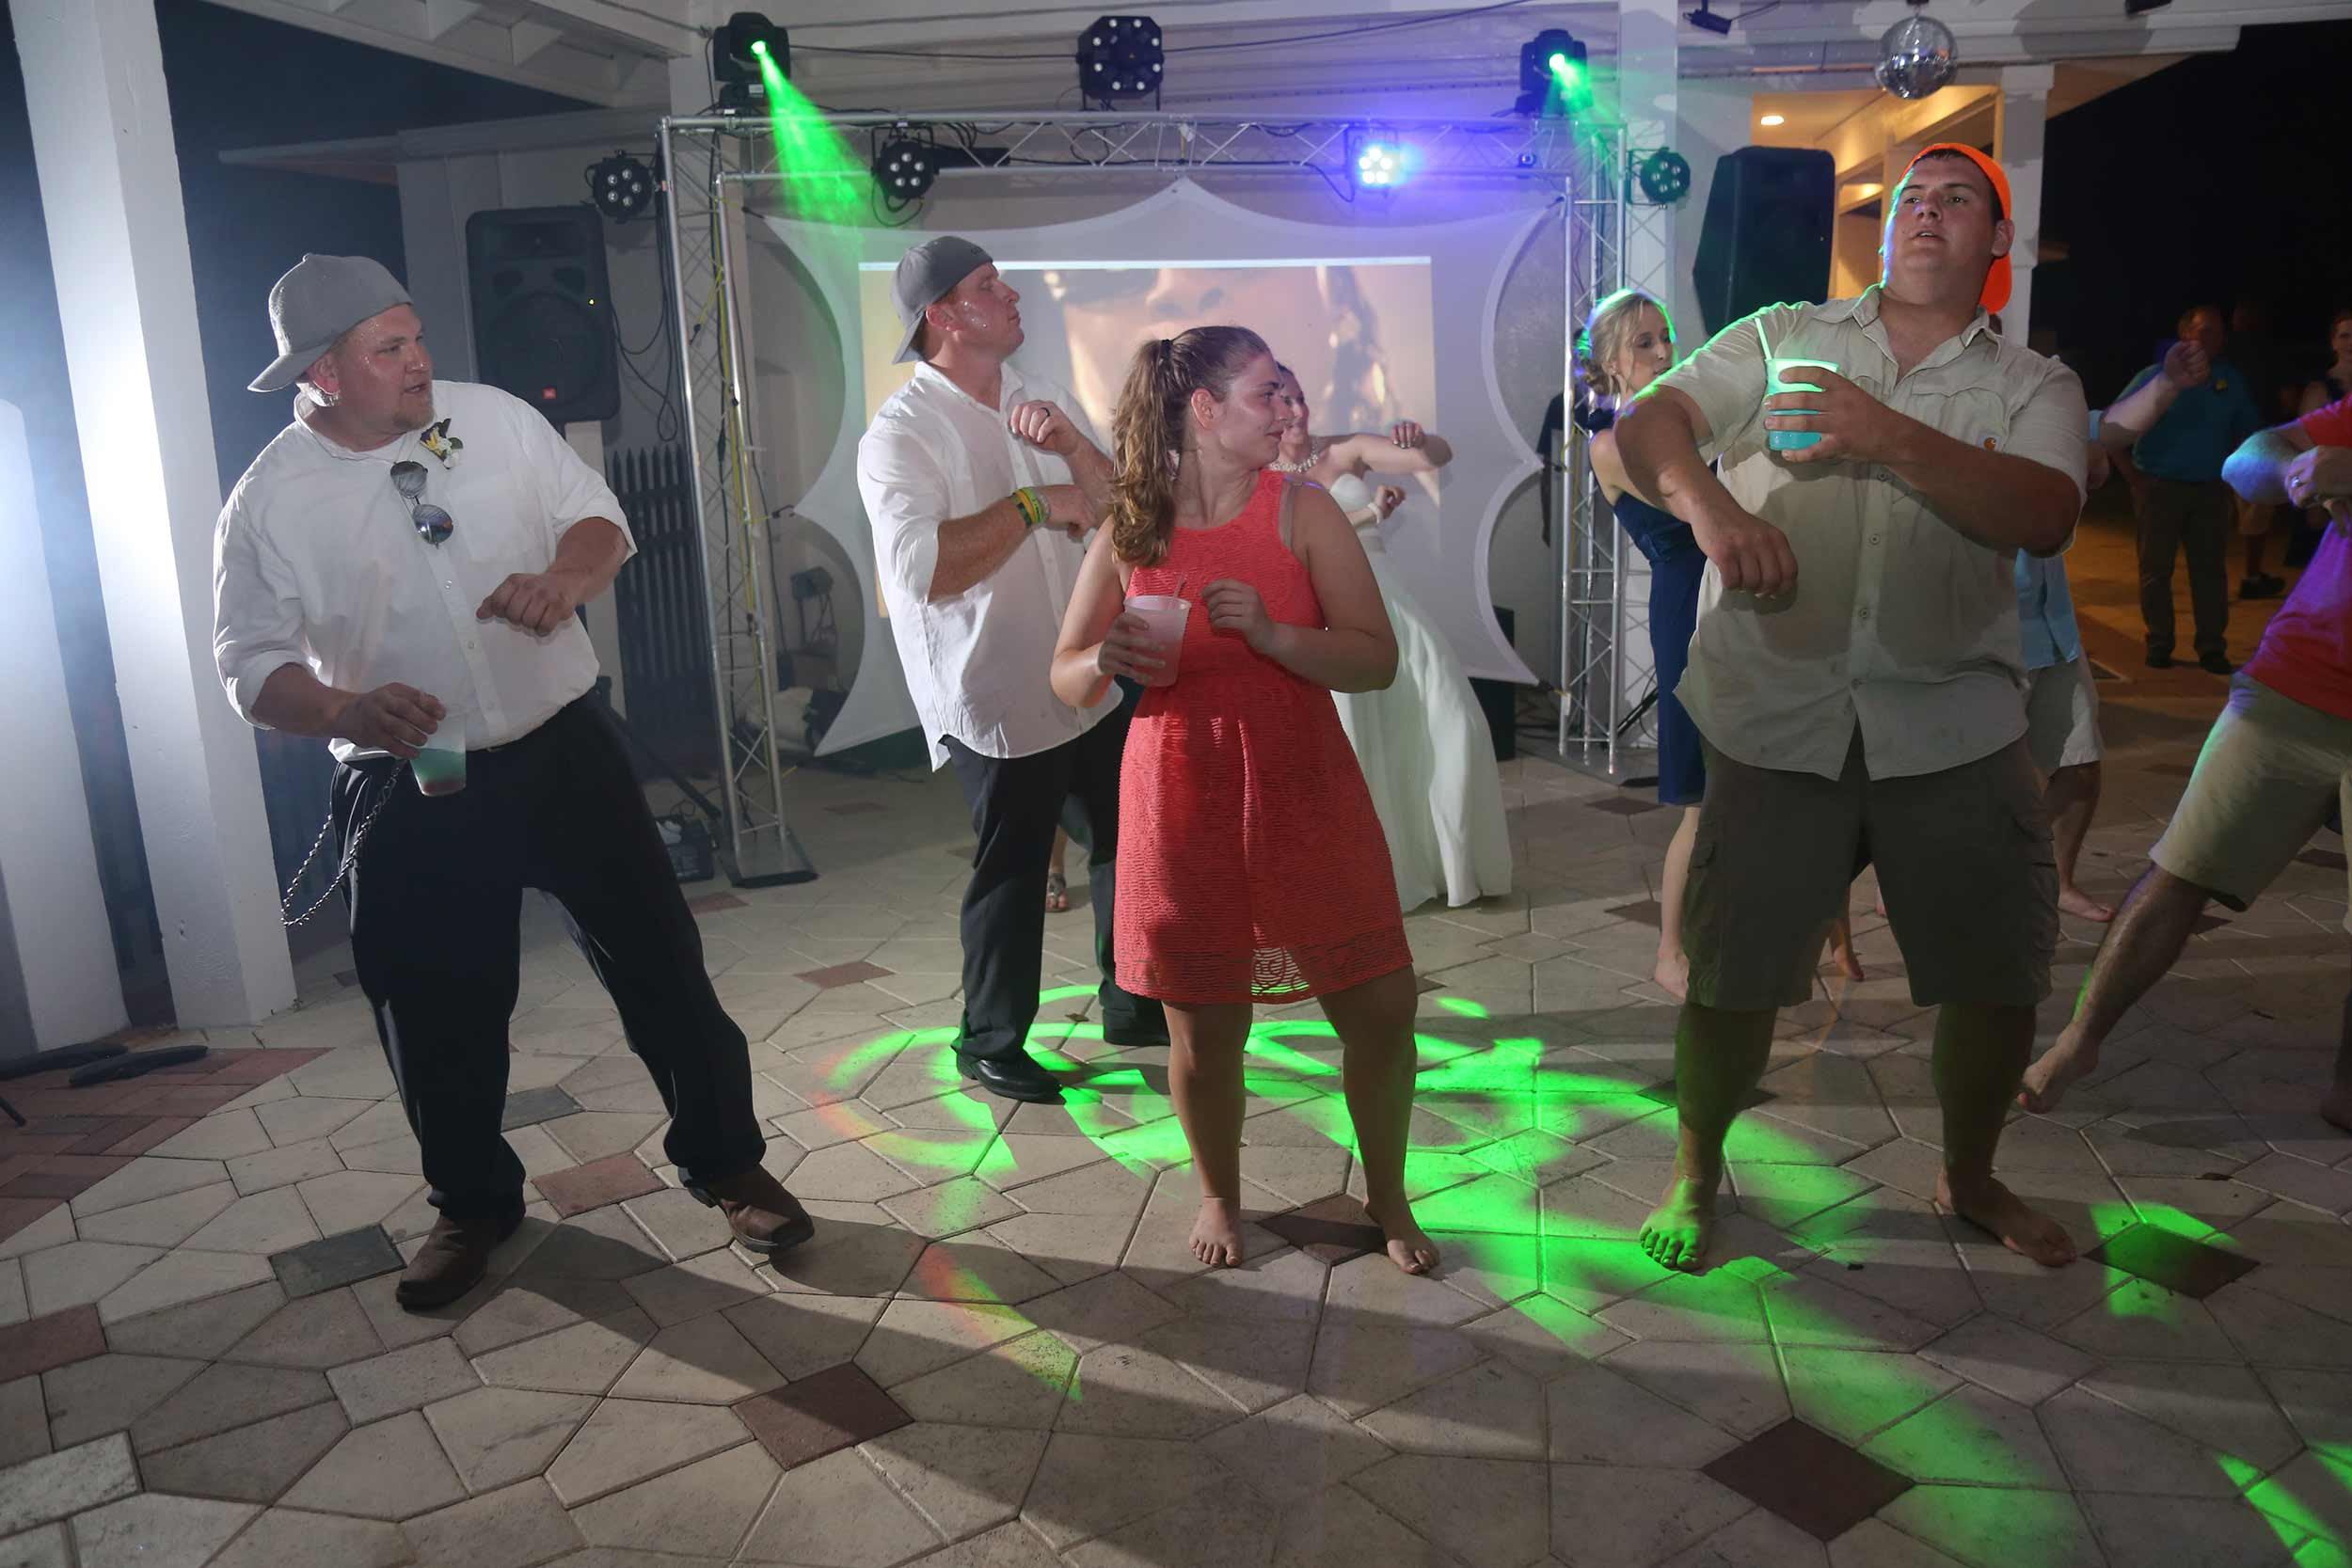 Weddings - DJ or Band